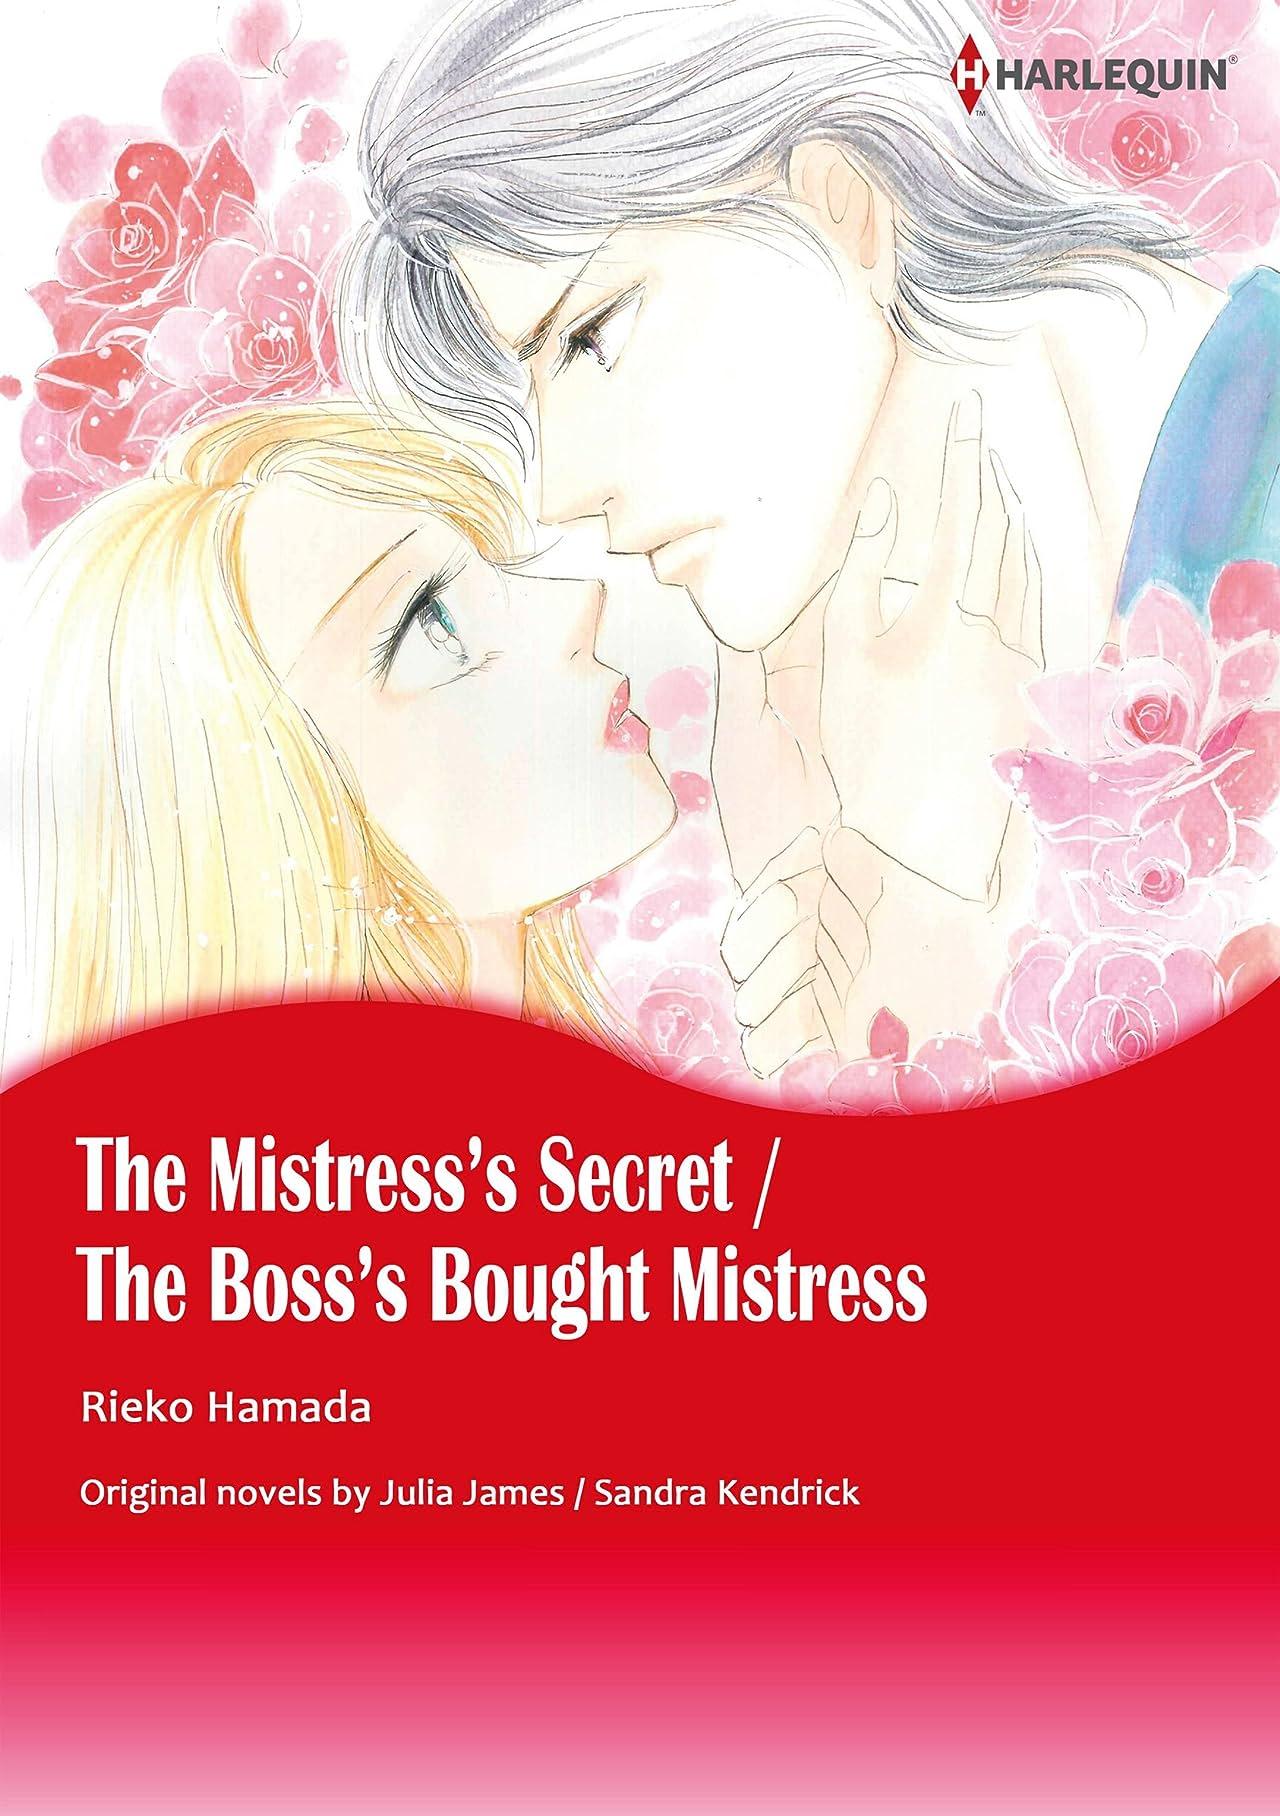 The Mistress's Secret / The Boss's Bought Mistress